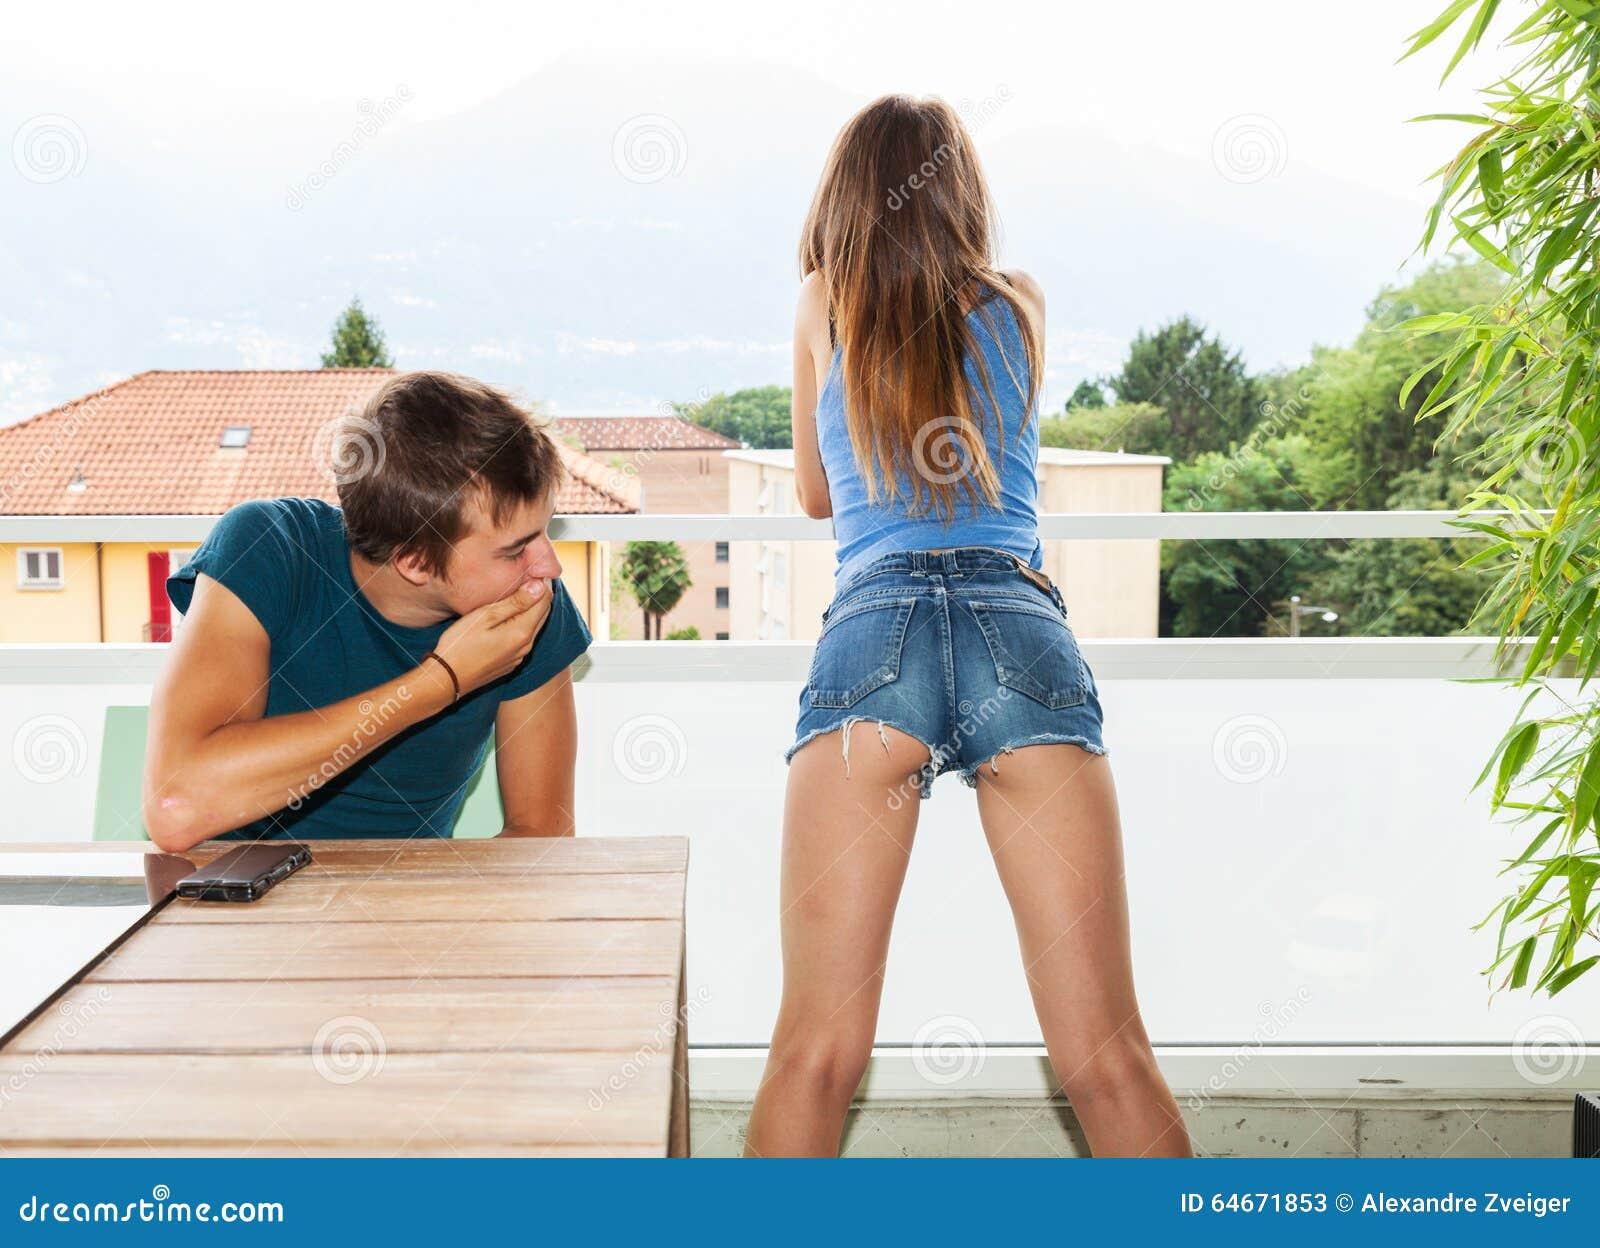 Looking at girls ass